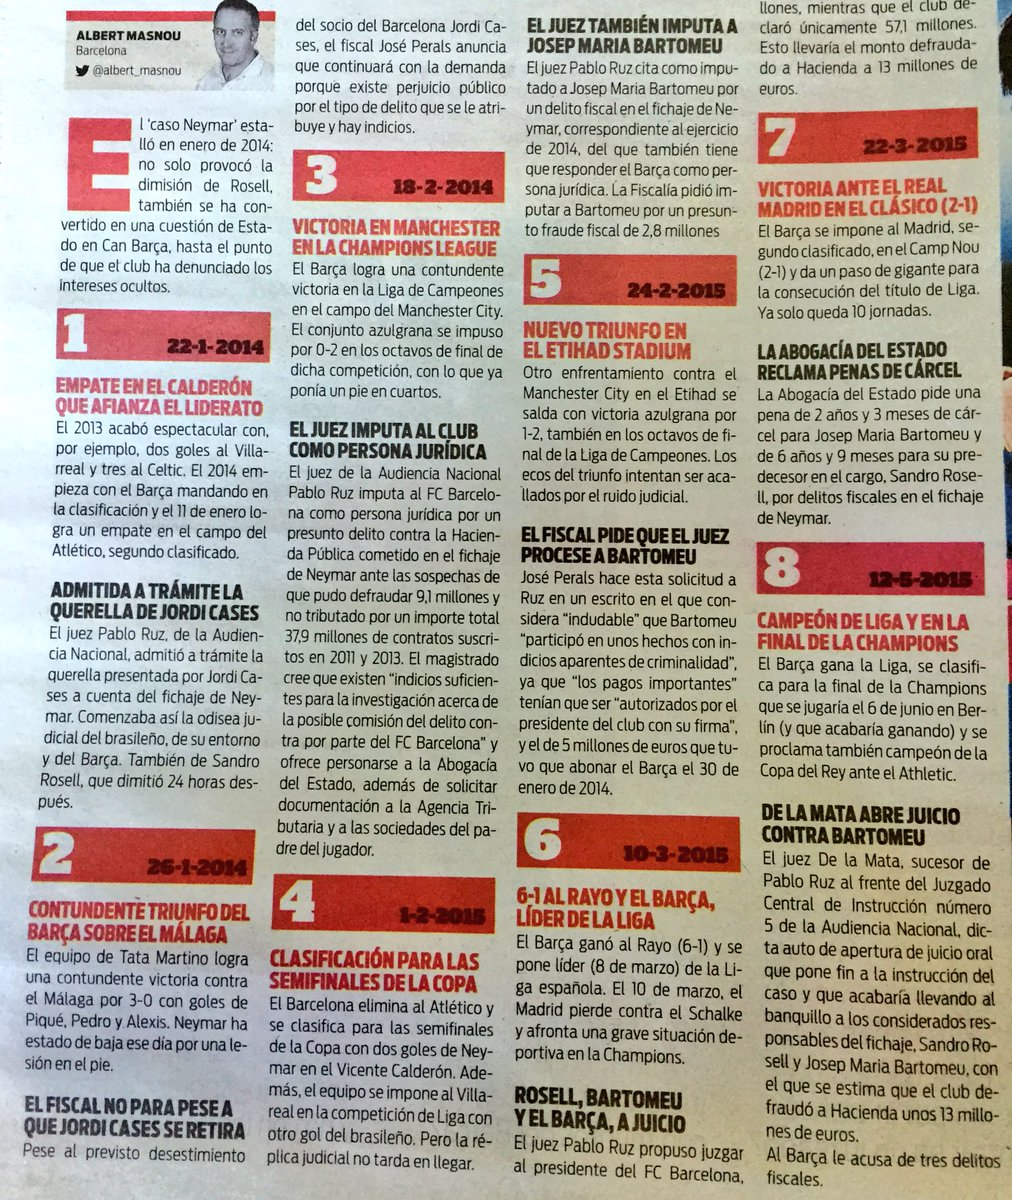 Messi va a acabar en la cárcel - Página 9 CkaSy-VWEAAk21a